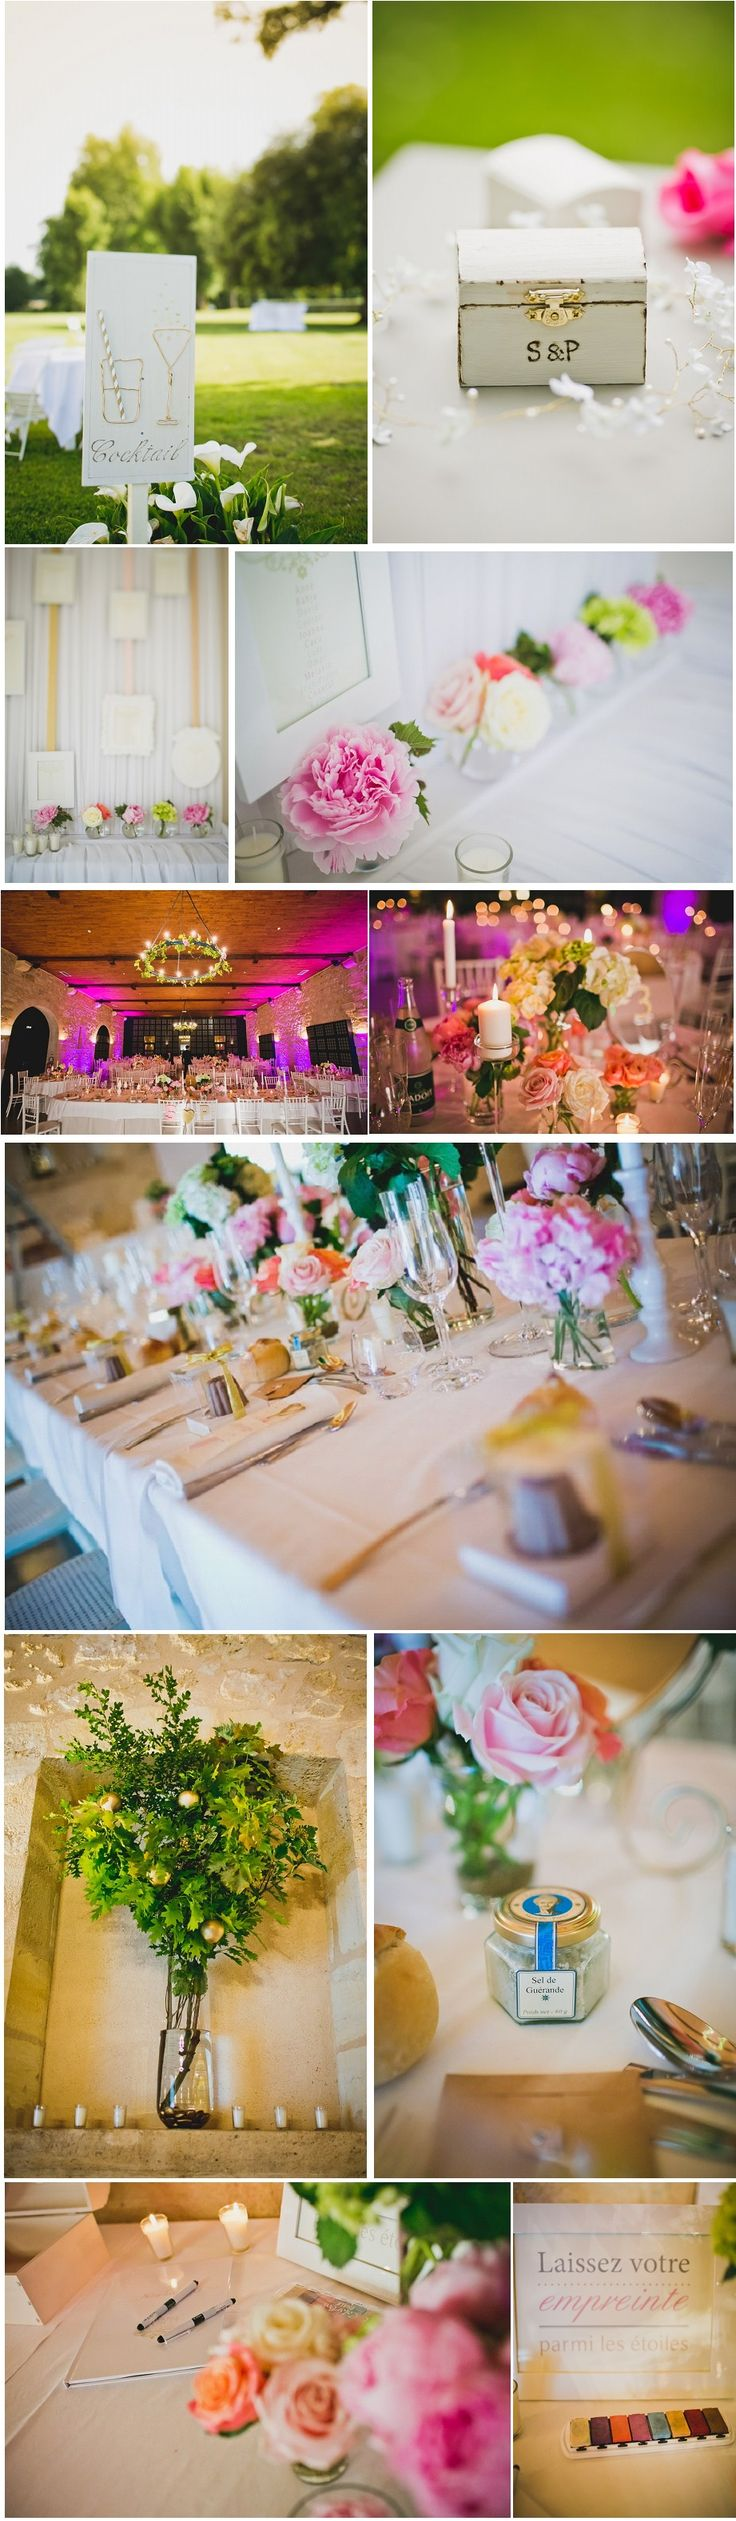 décoration mariage, photographe : DavidOne